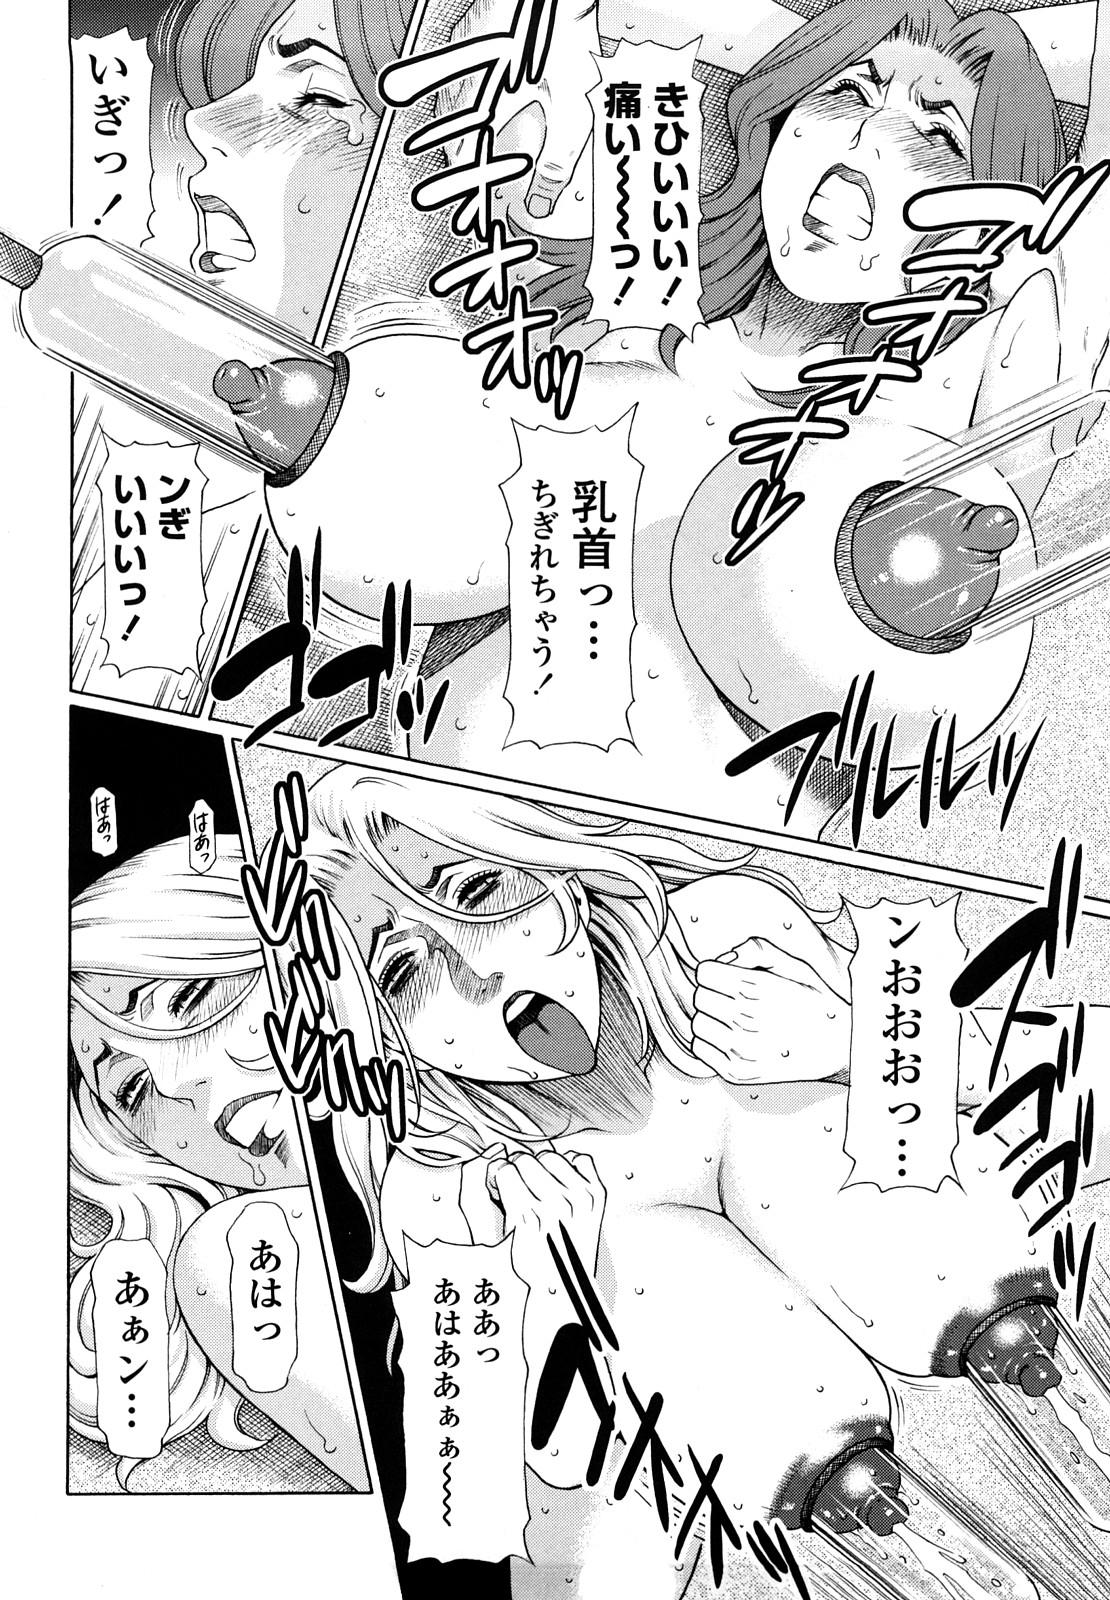 [Takasugi Kou] Kindan no Haha-Ana - Immorality Love-Hole [Decensored] 113